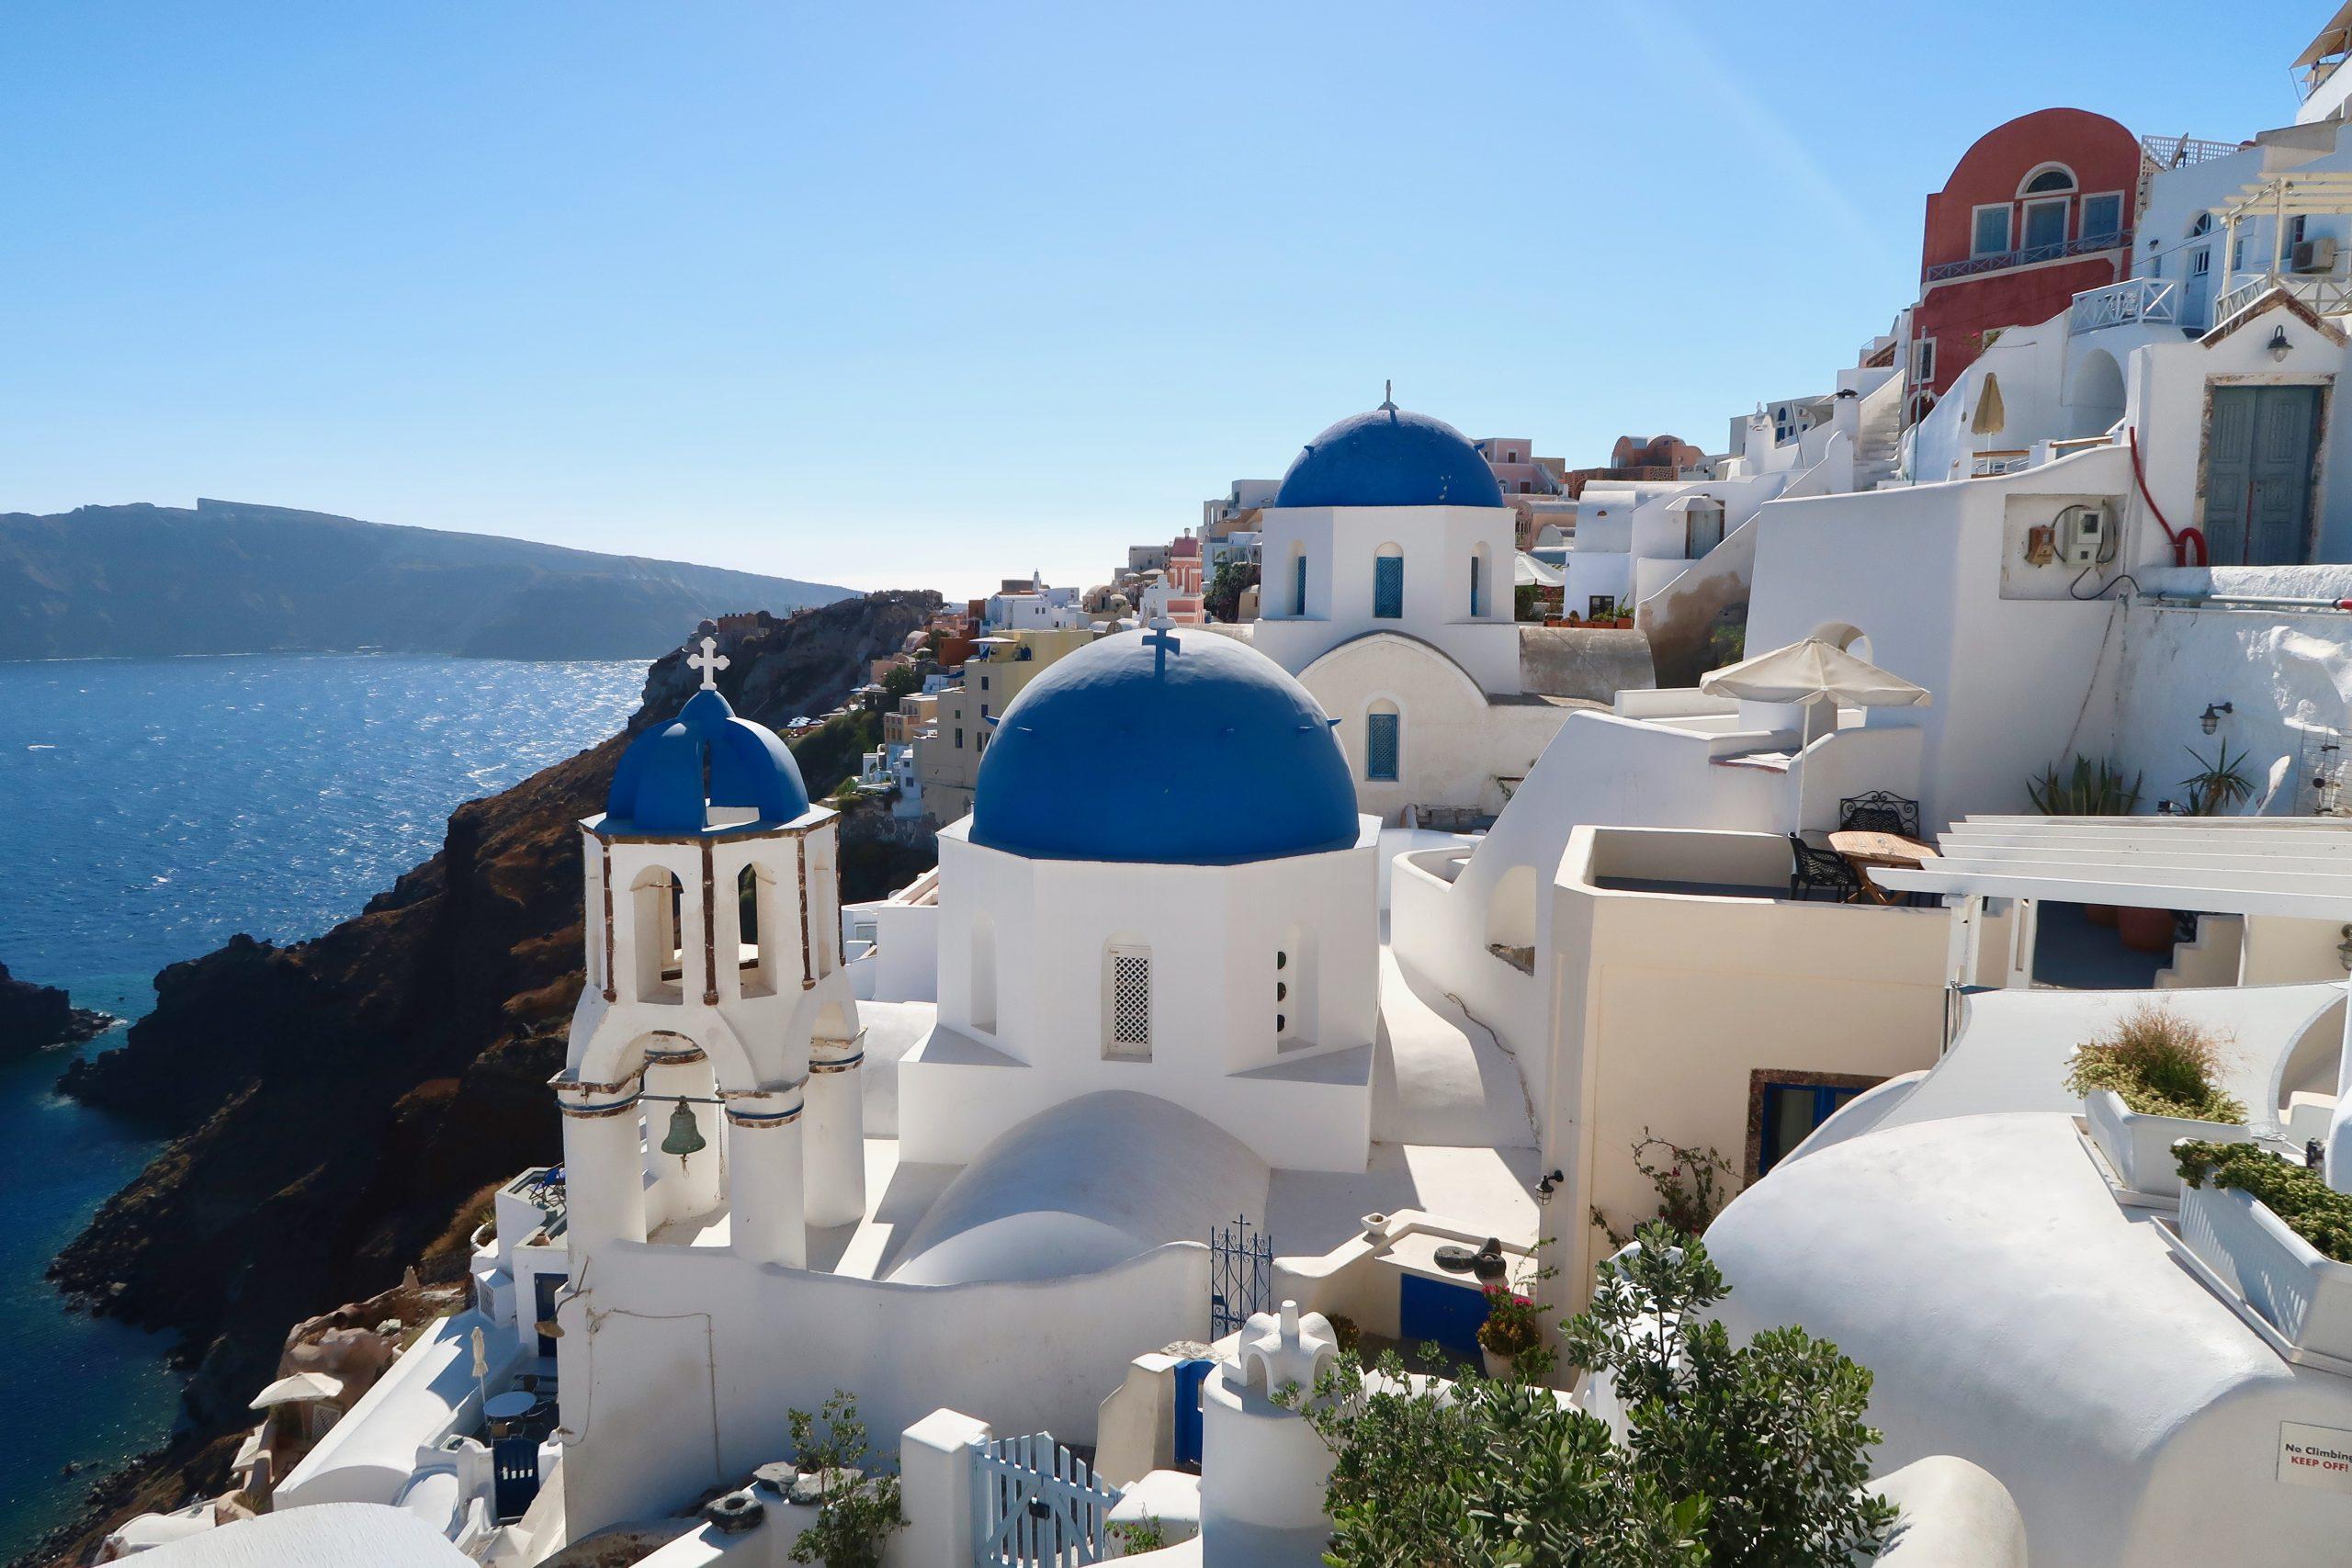 EXPLORING SANTORINI GREECE